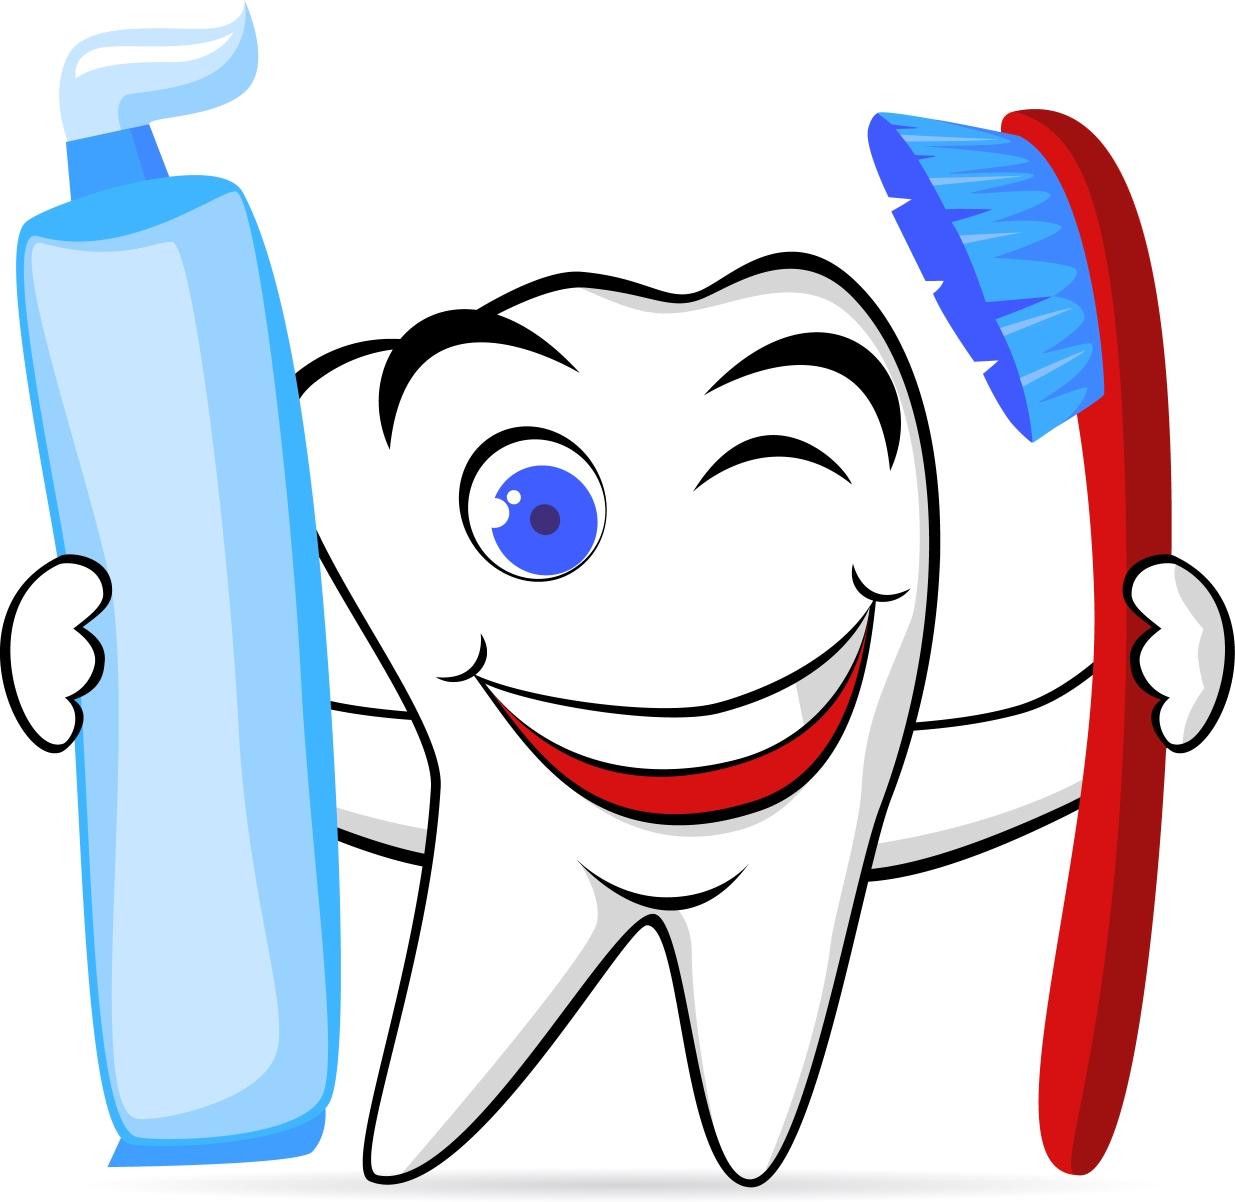 1235x1202 Clip Art Clip Art Of Brushing Teeth